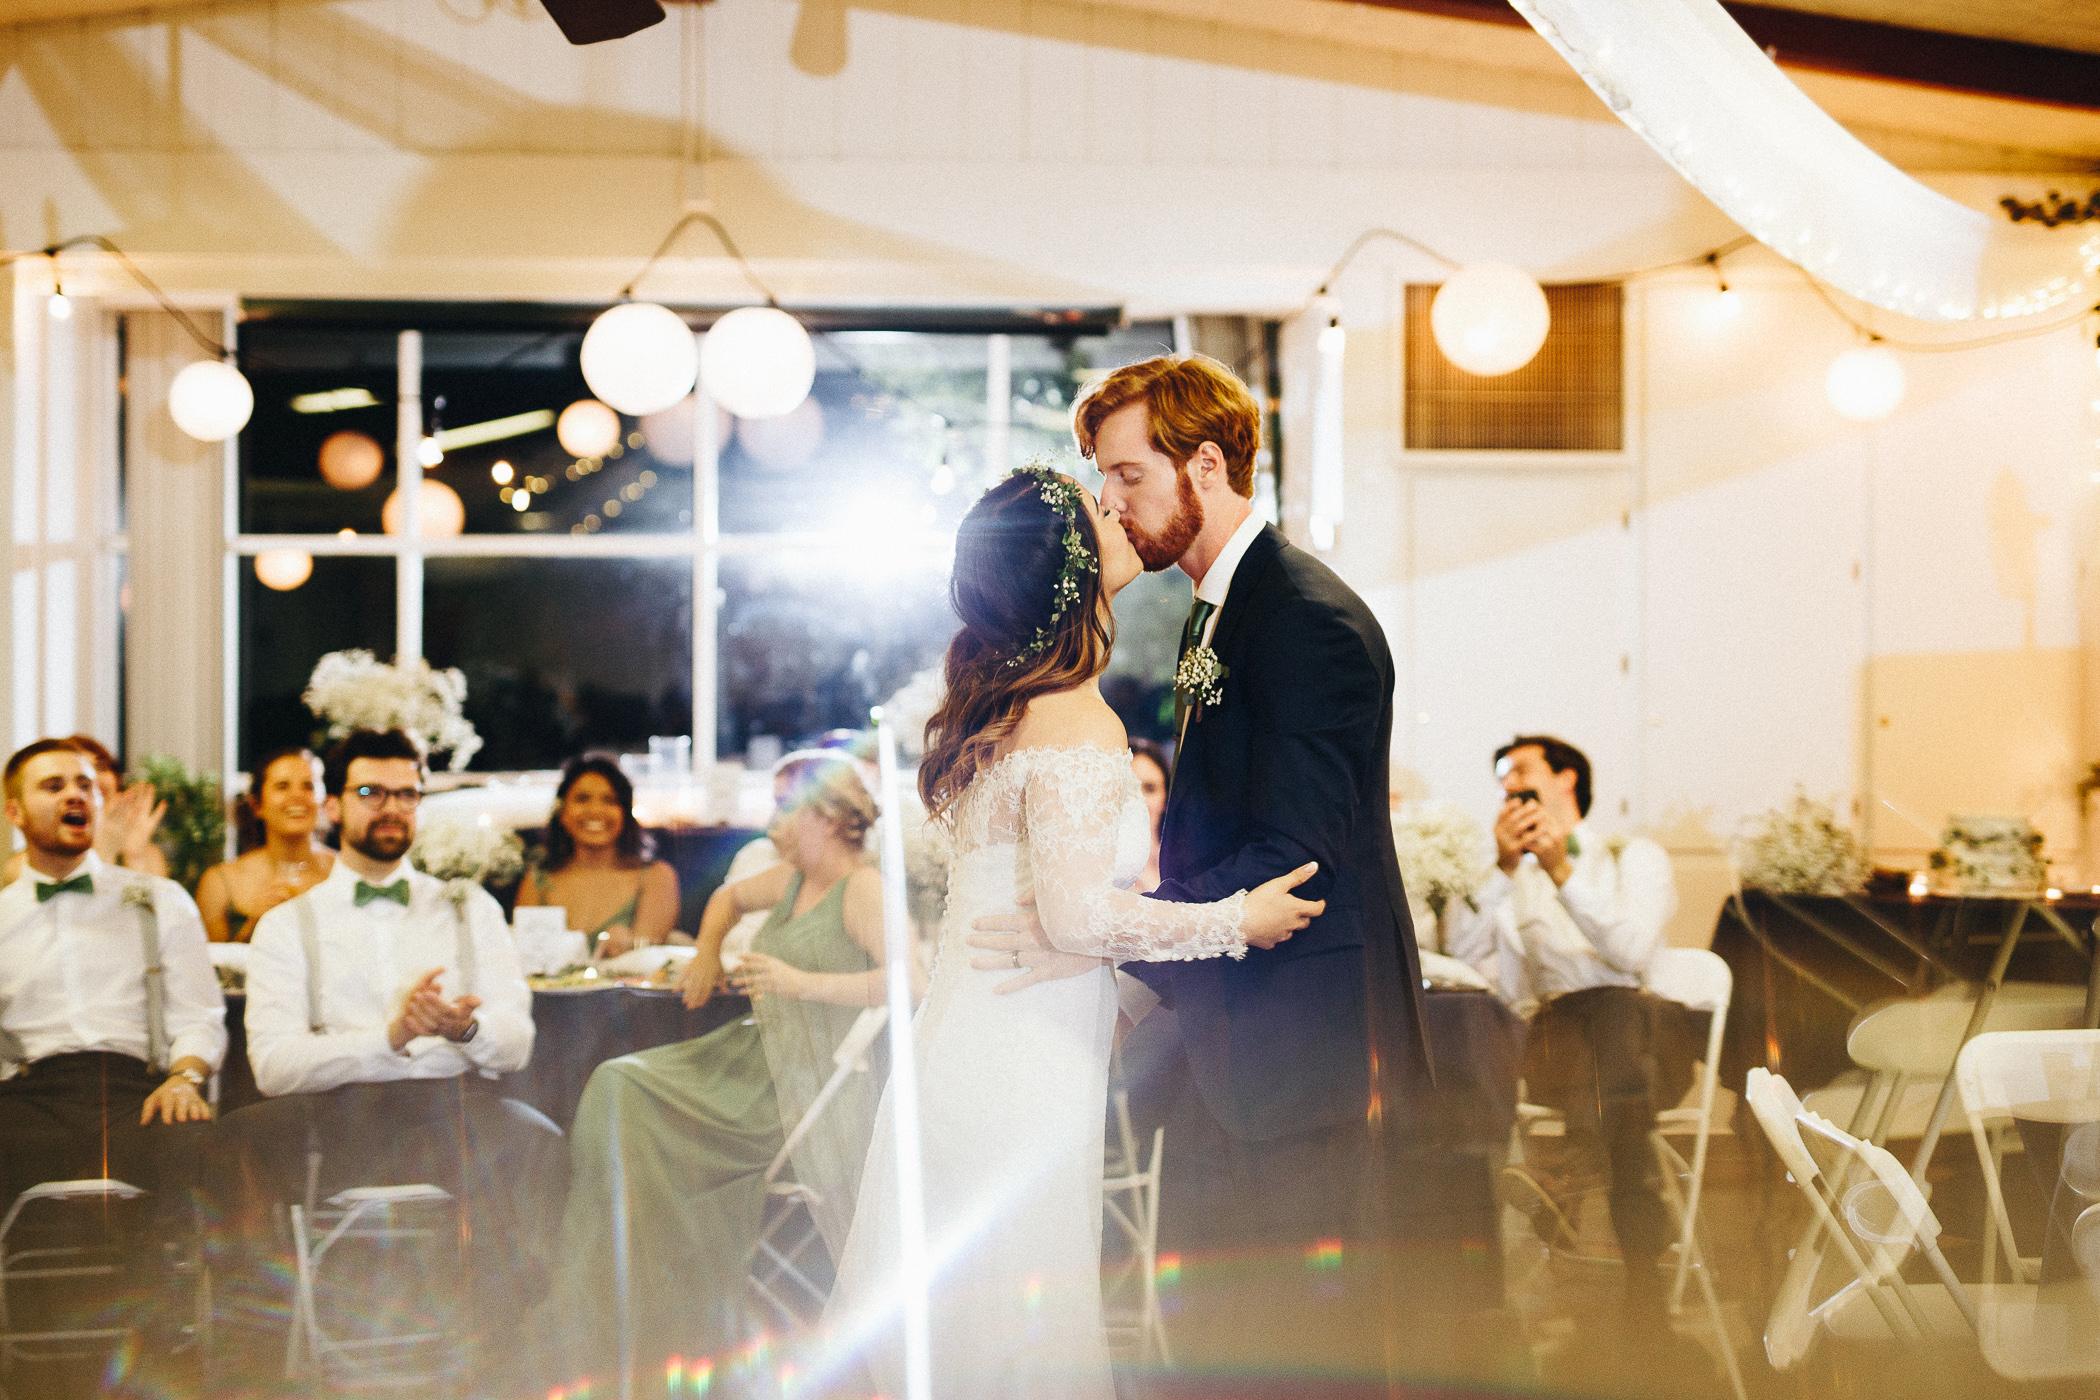 181104-Luxium-Weddings-Arizona-@matt__Le-Brandon-Kariana-Phoenix-Valley-Garden-Center-1131.jpg